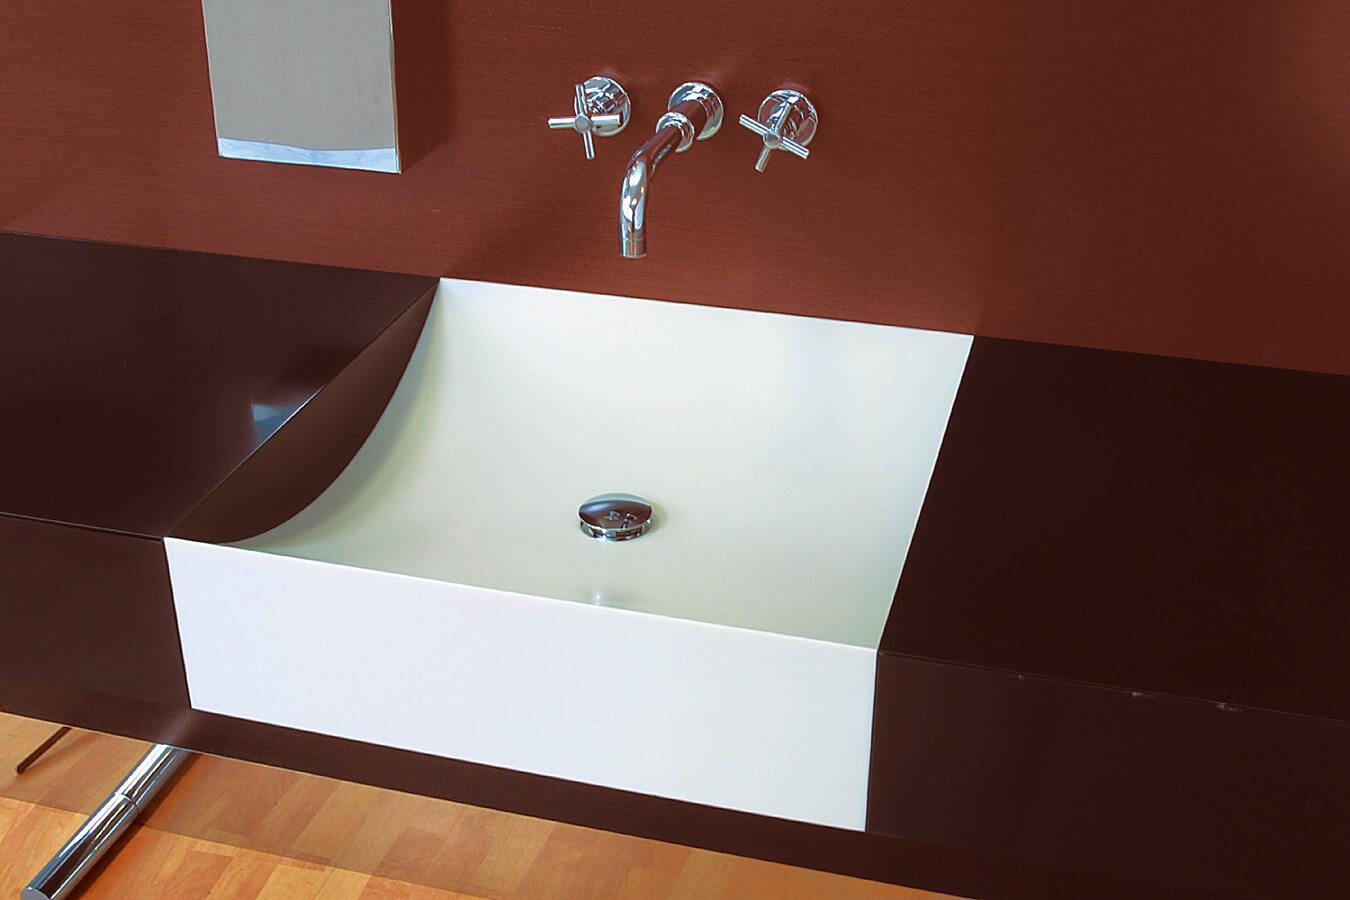 Corian Badkamer Onderhoud : Corian badkamer u badkamermeubel op maat correnti